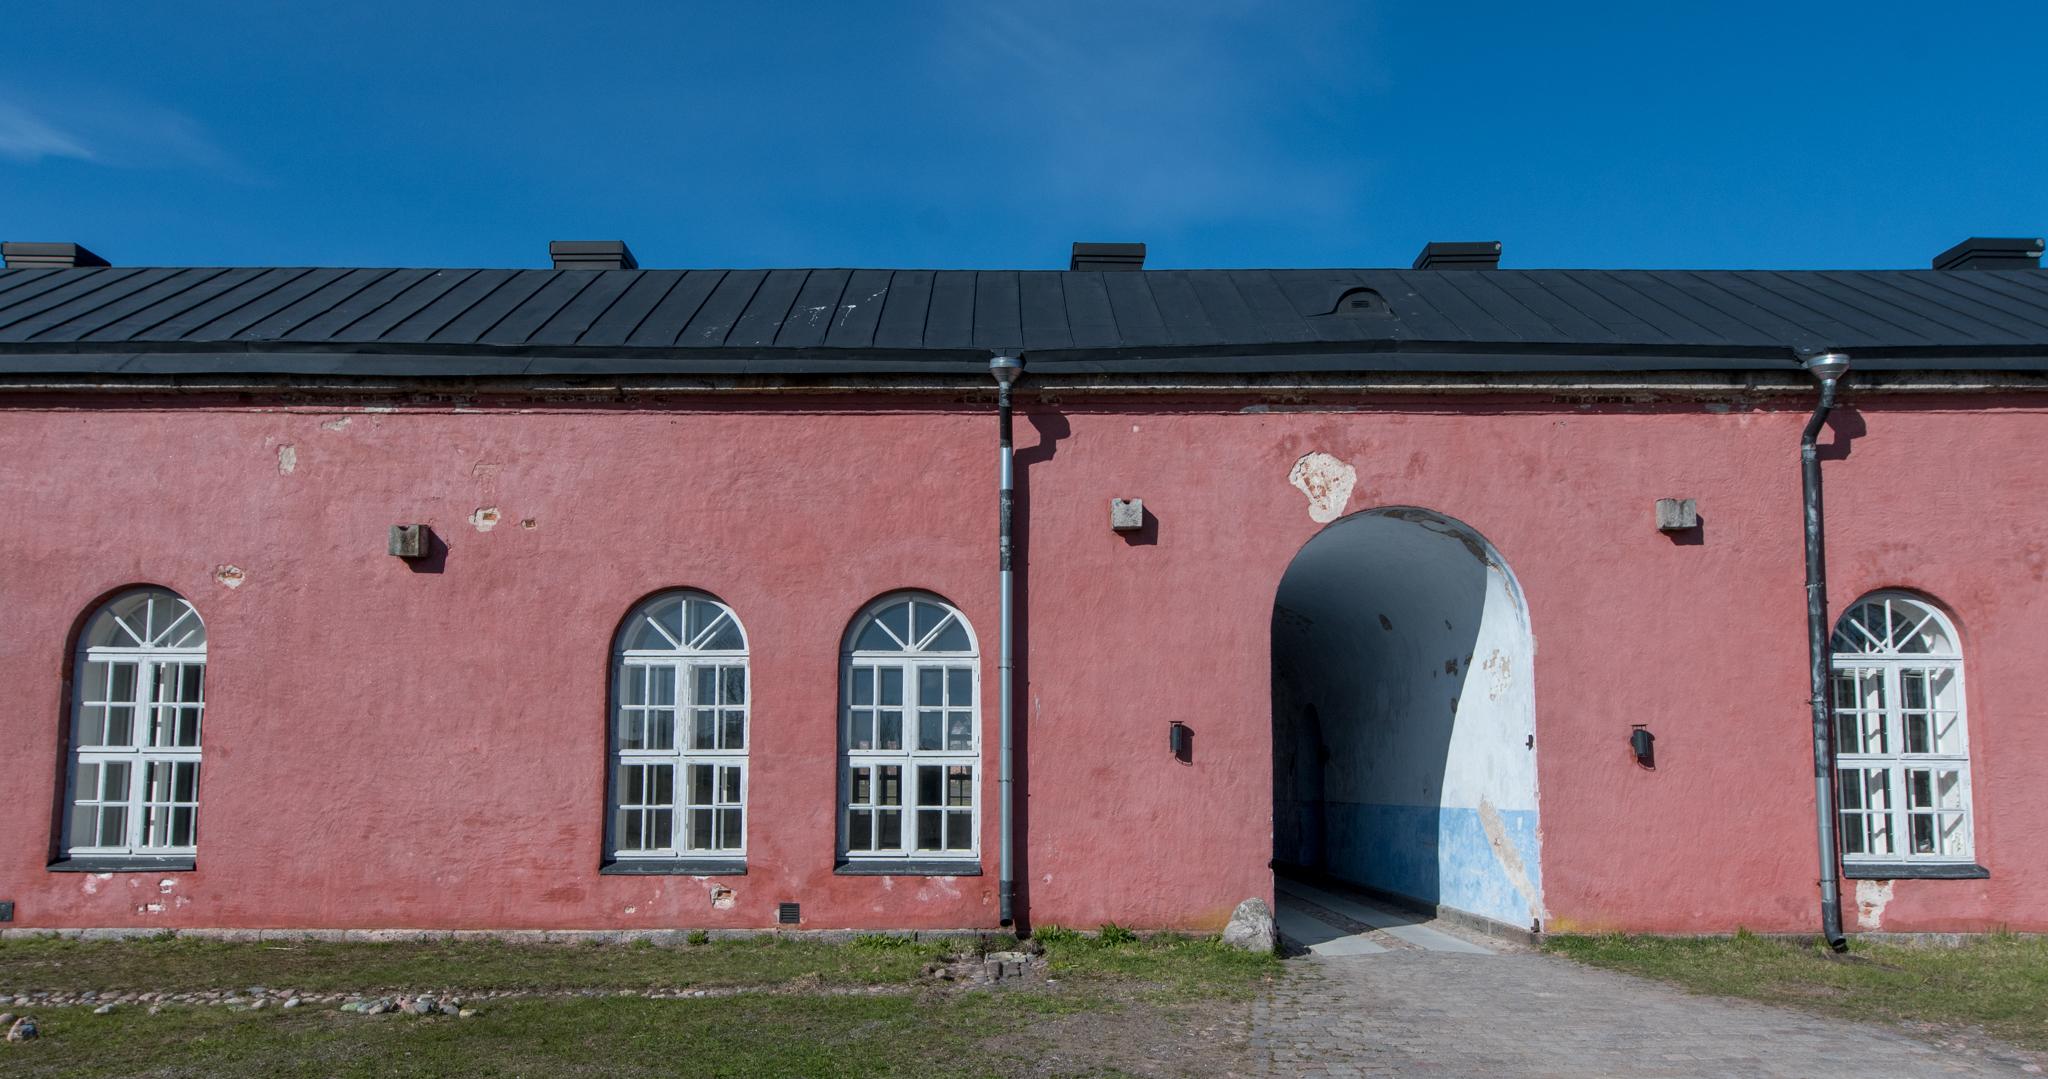 20180428_165640_Suomenlinna_Veneretki